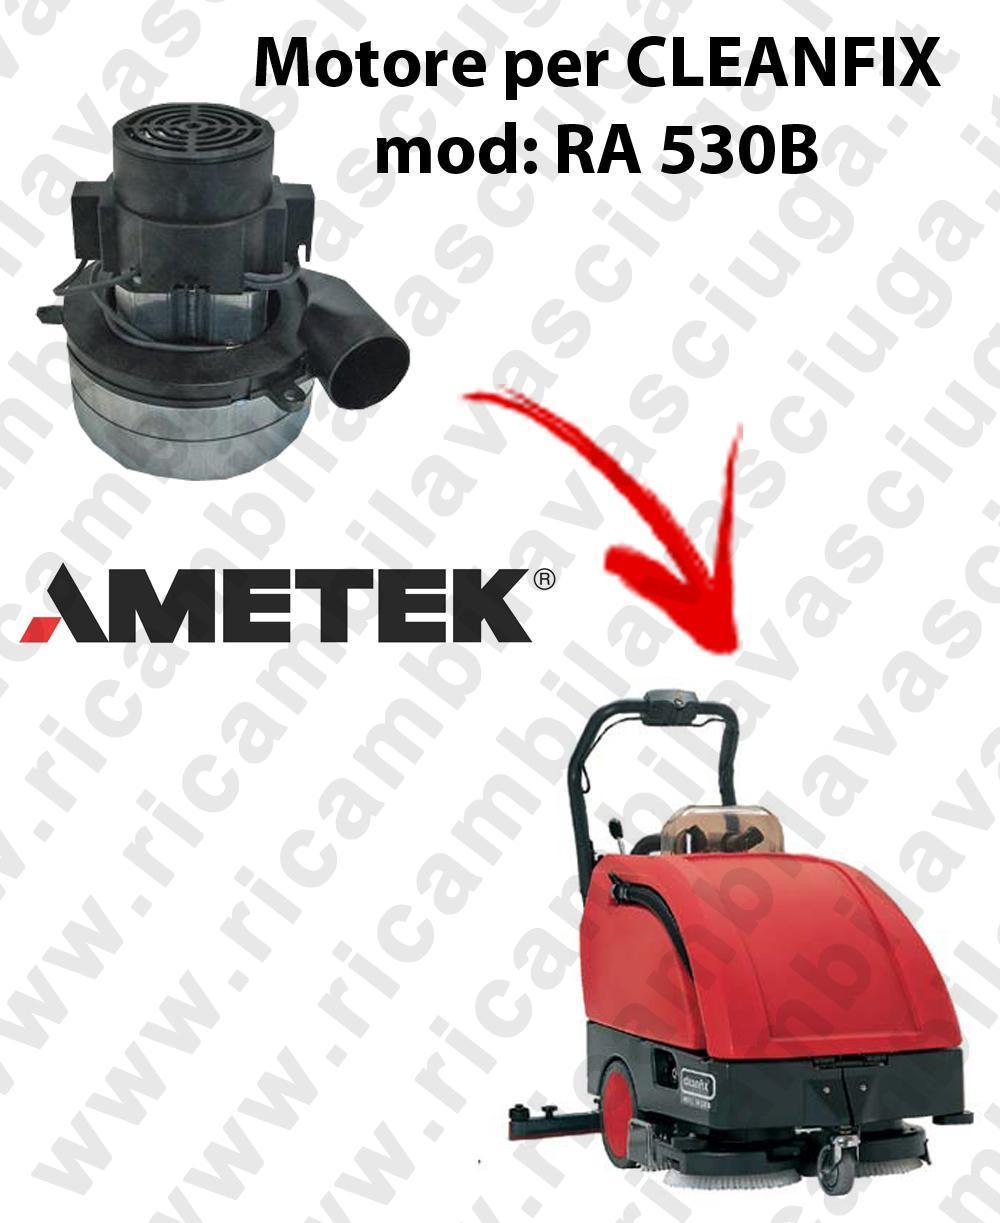 RA 530B Saugmotor AMETEK ITALIA für scheuersaugmaschinen CLEANFIX